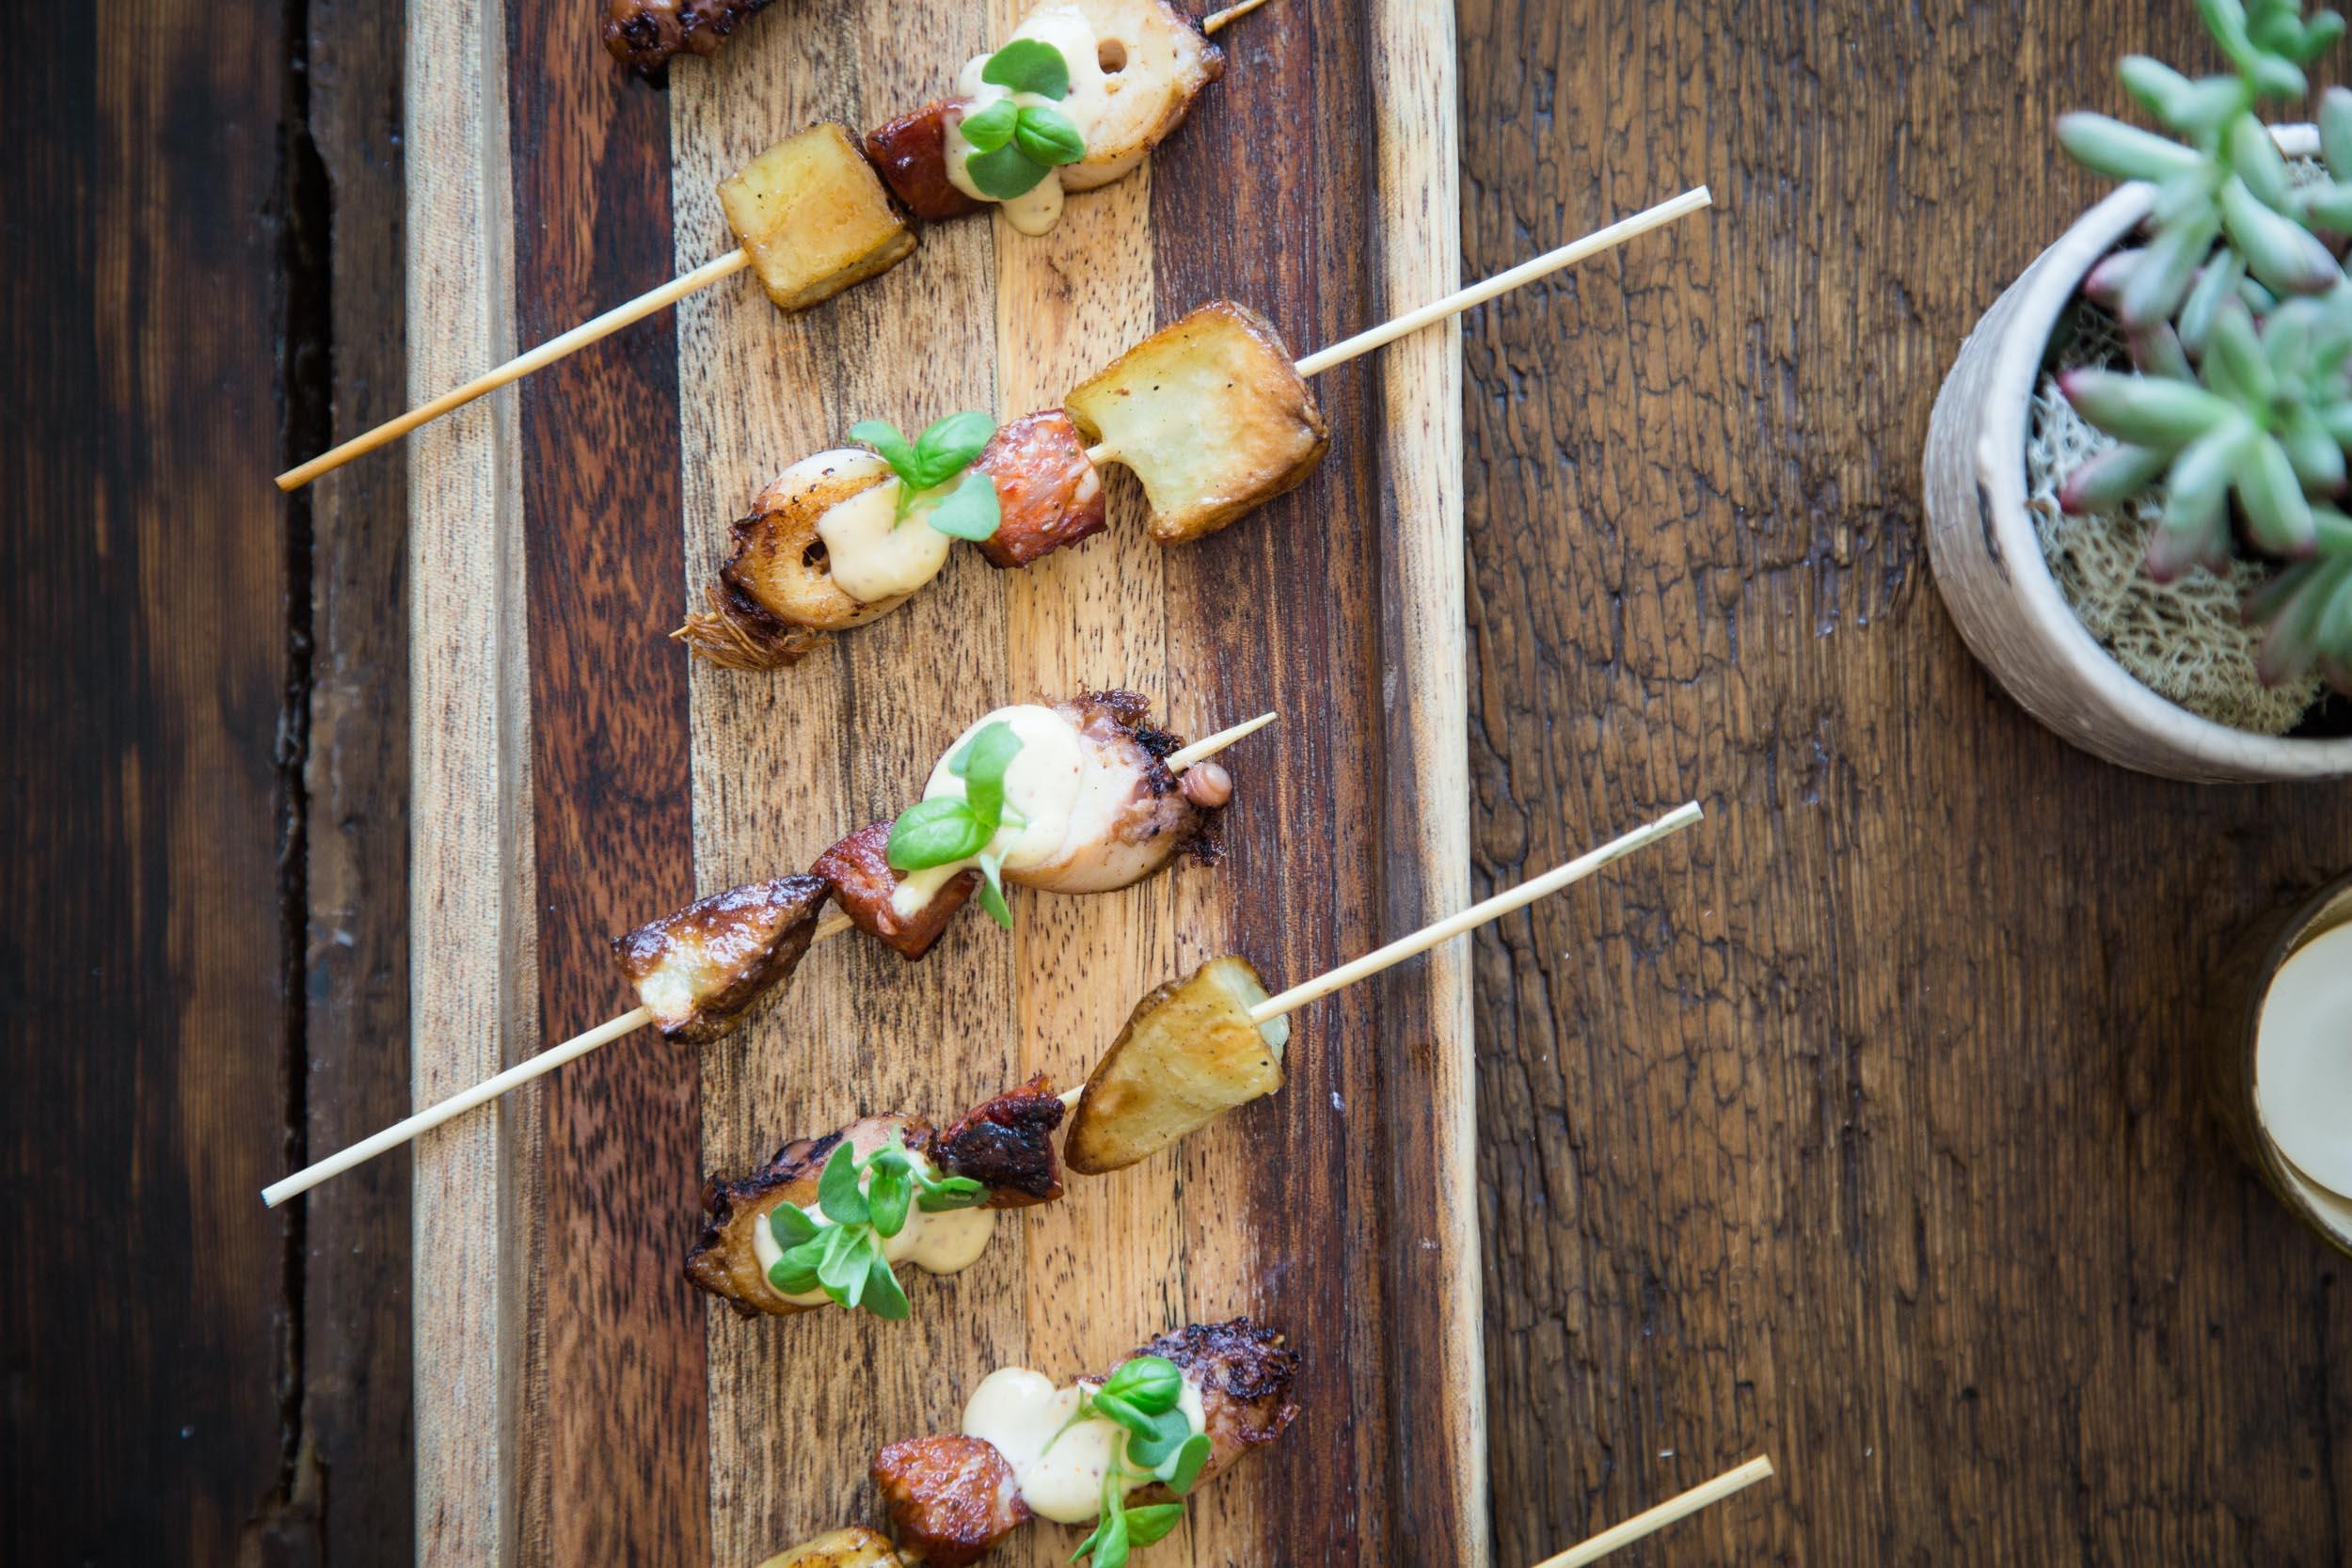 Braised Octopus Skewer with Maine Potatoes, Chorizo, and Lemon Aïoli